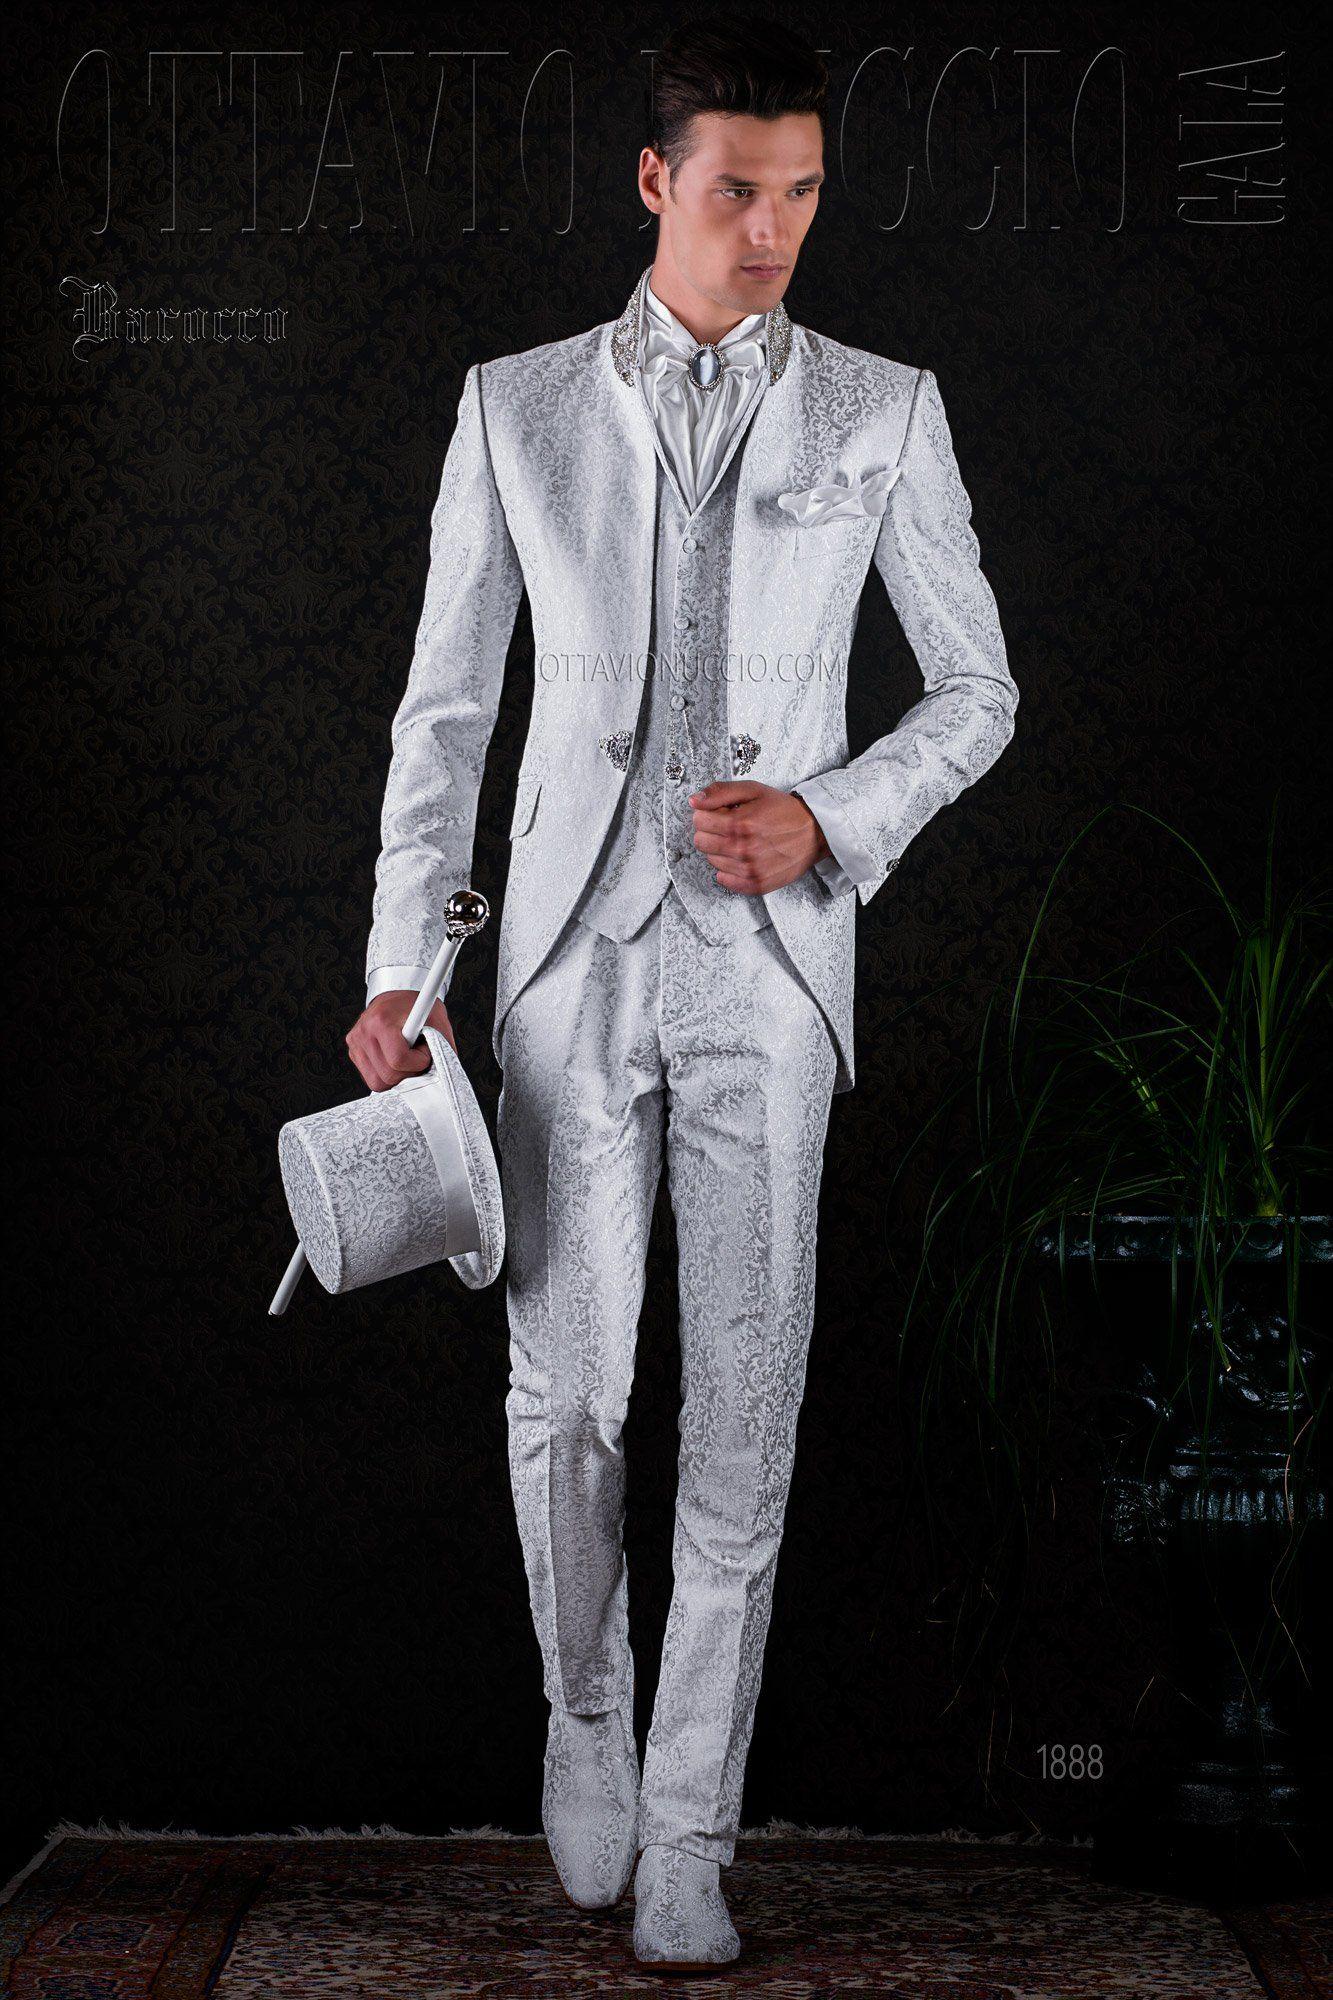 03b13ee422 Brocade white mandarin collar baroque tuxedo #wedding #groom #suit #vintage  #luxury #dapper #bespoke #italy